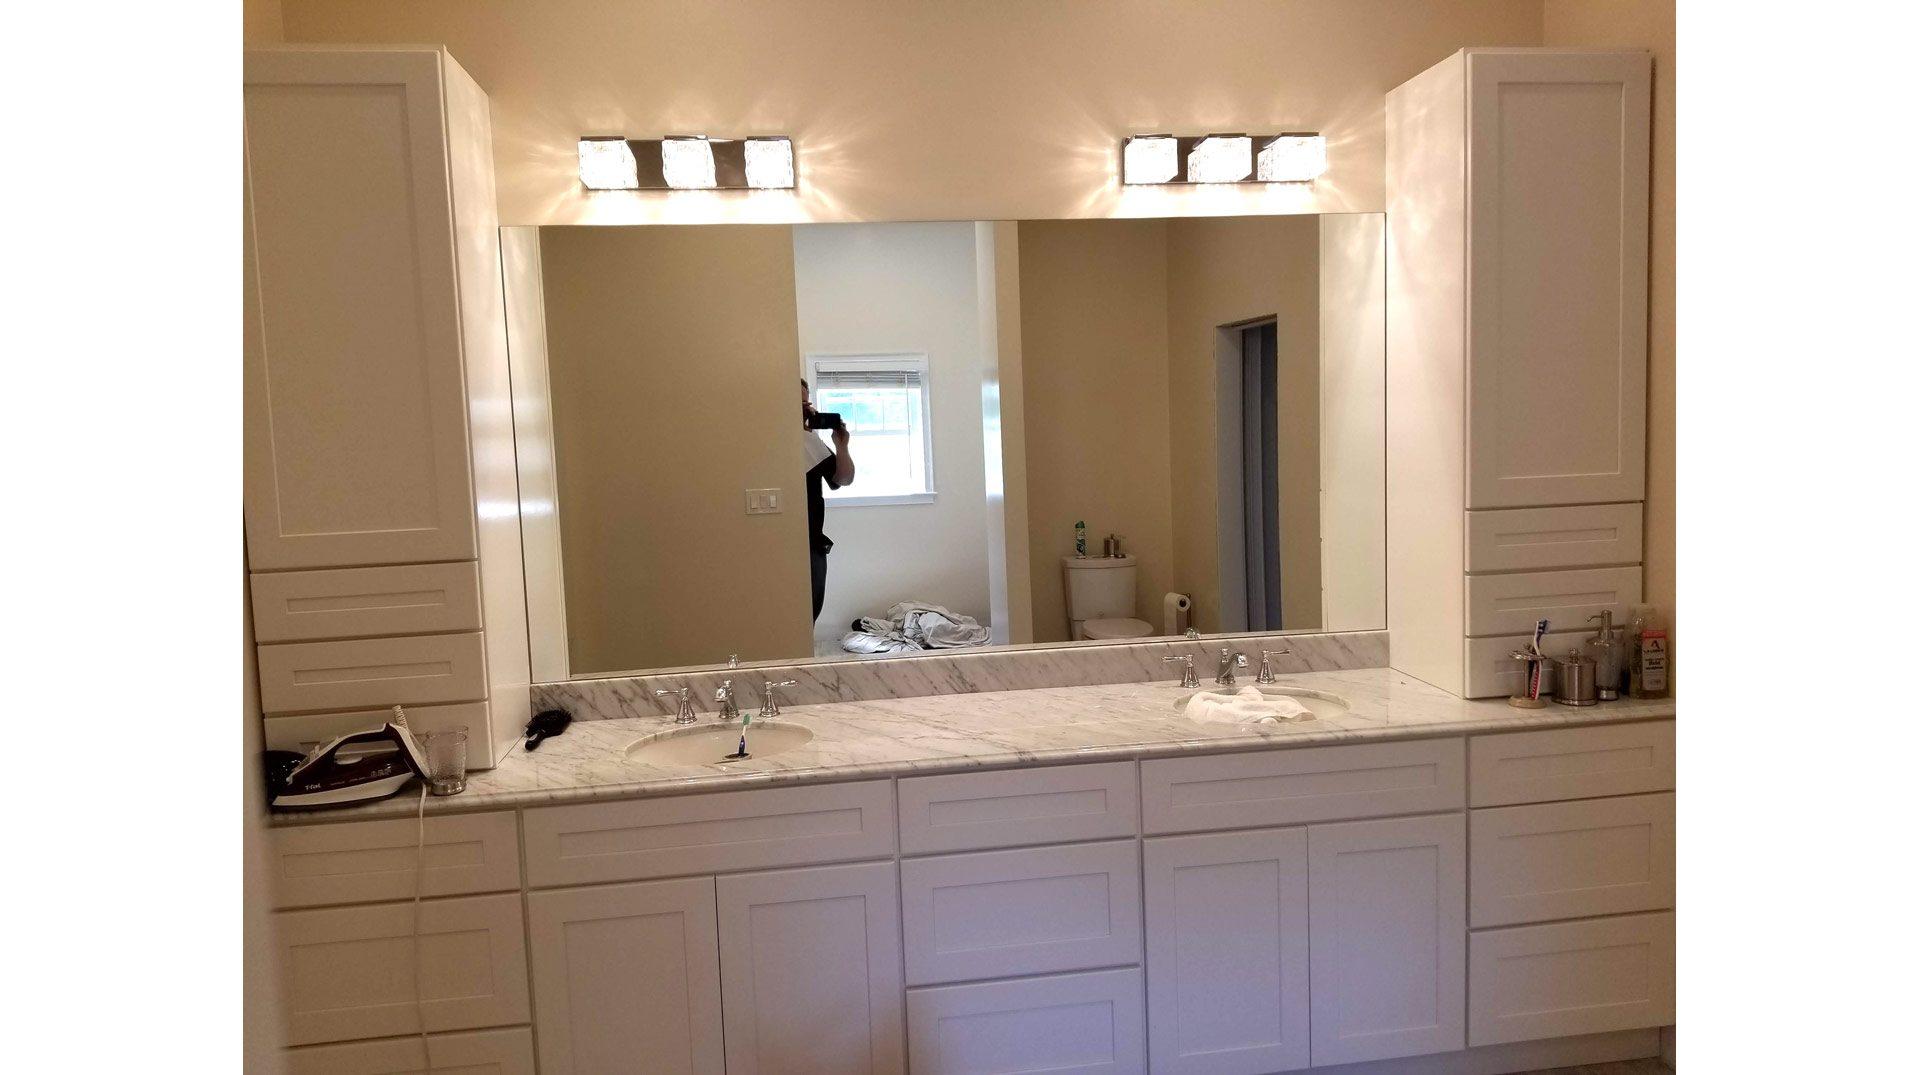 Double Vanity Mirror in Halifax MA